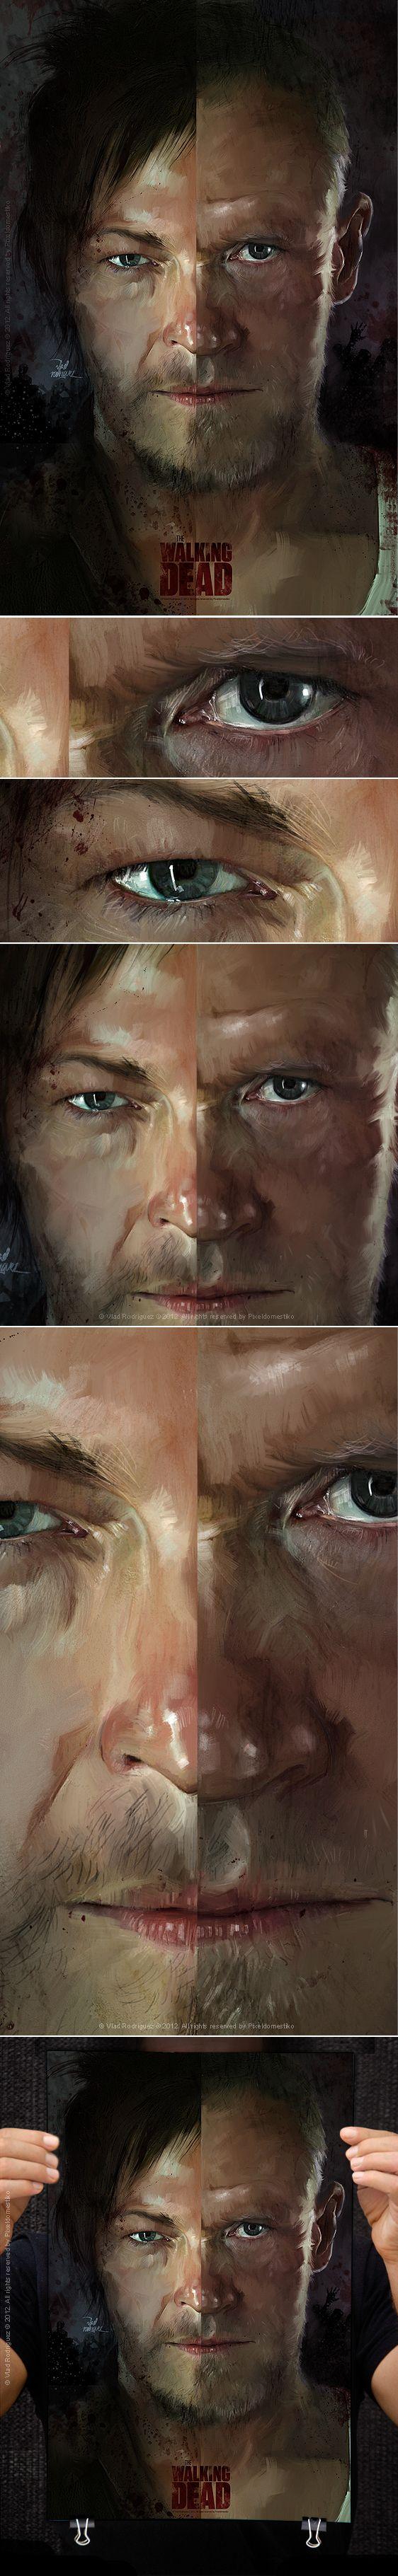 The Walking Dead ( Merle & Daryl Dixon) by Vlad Rodriguez, via Behance